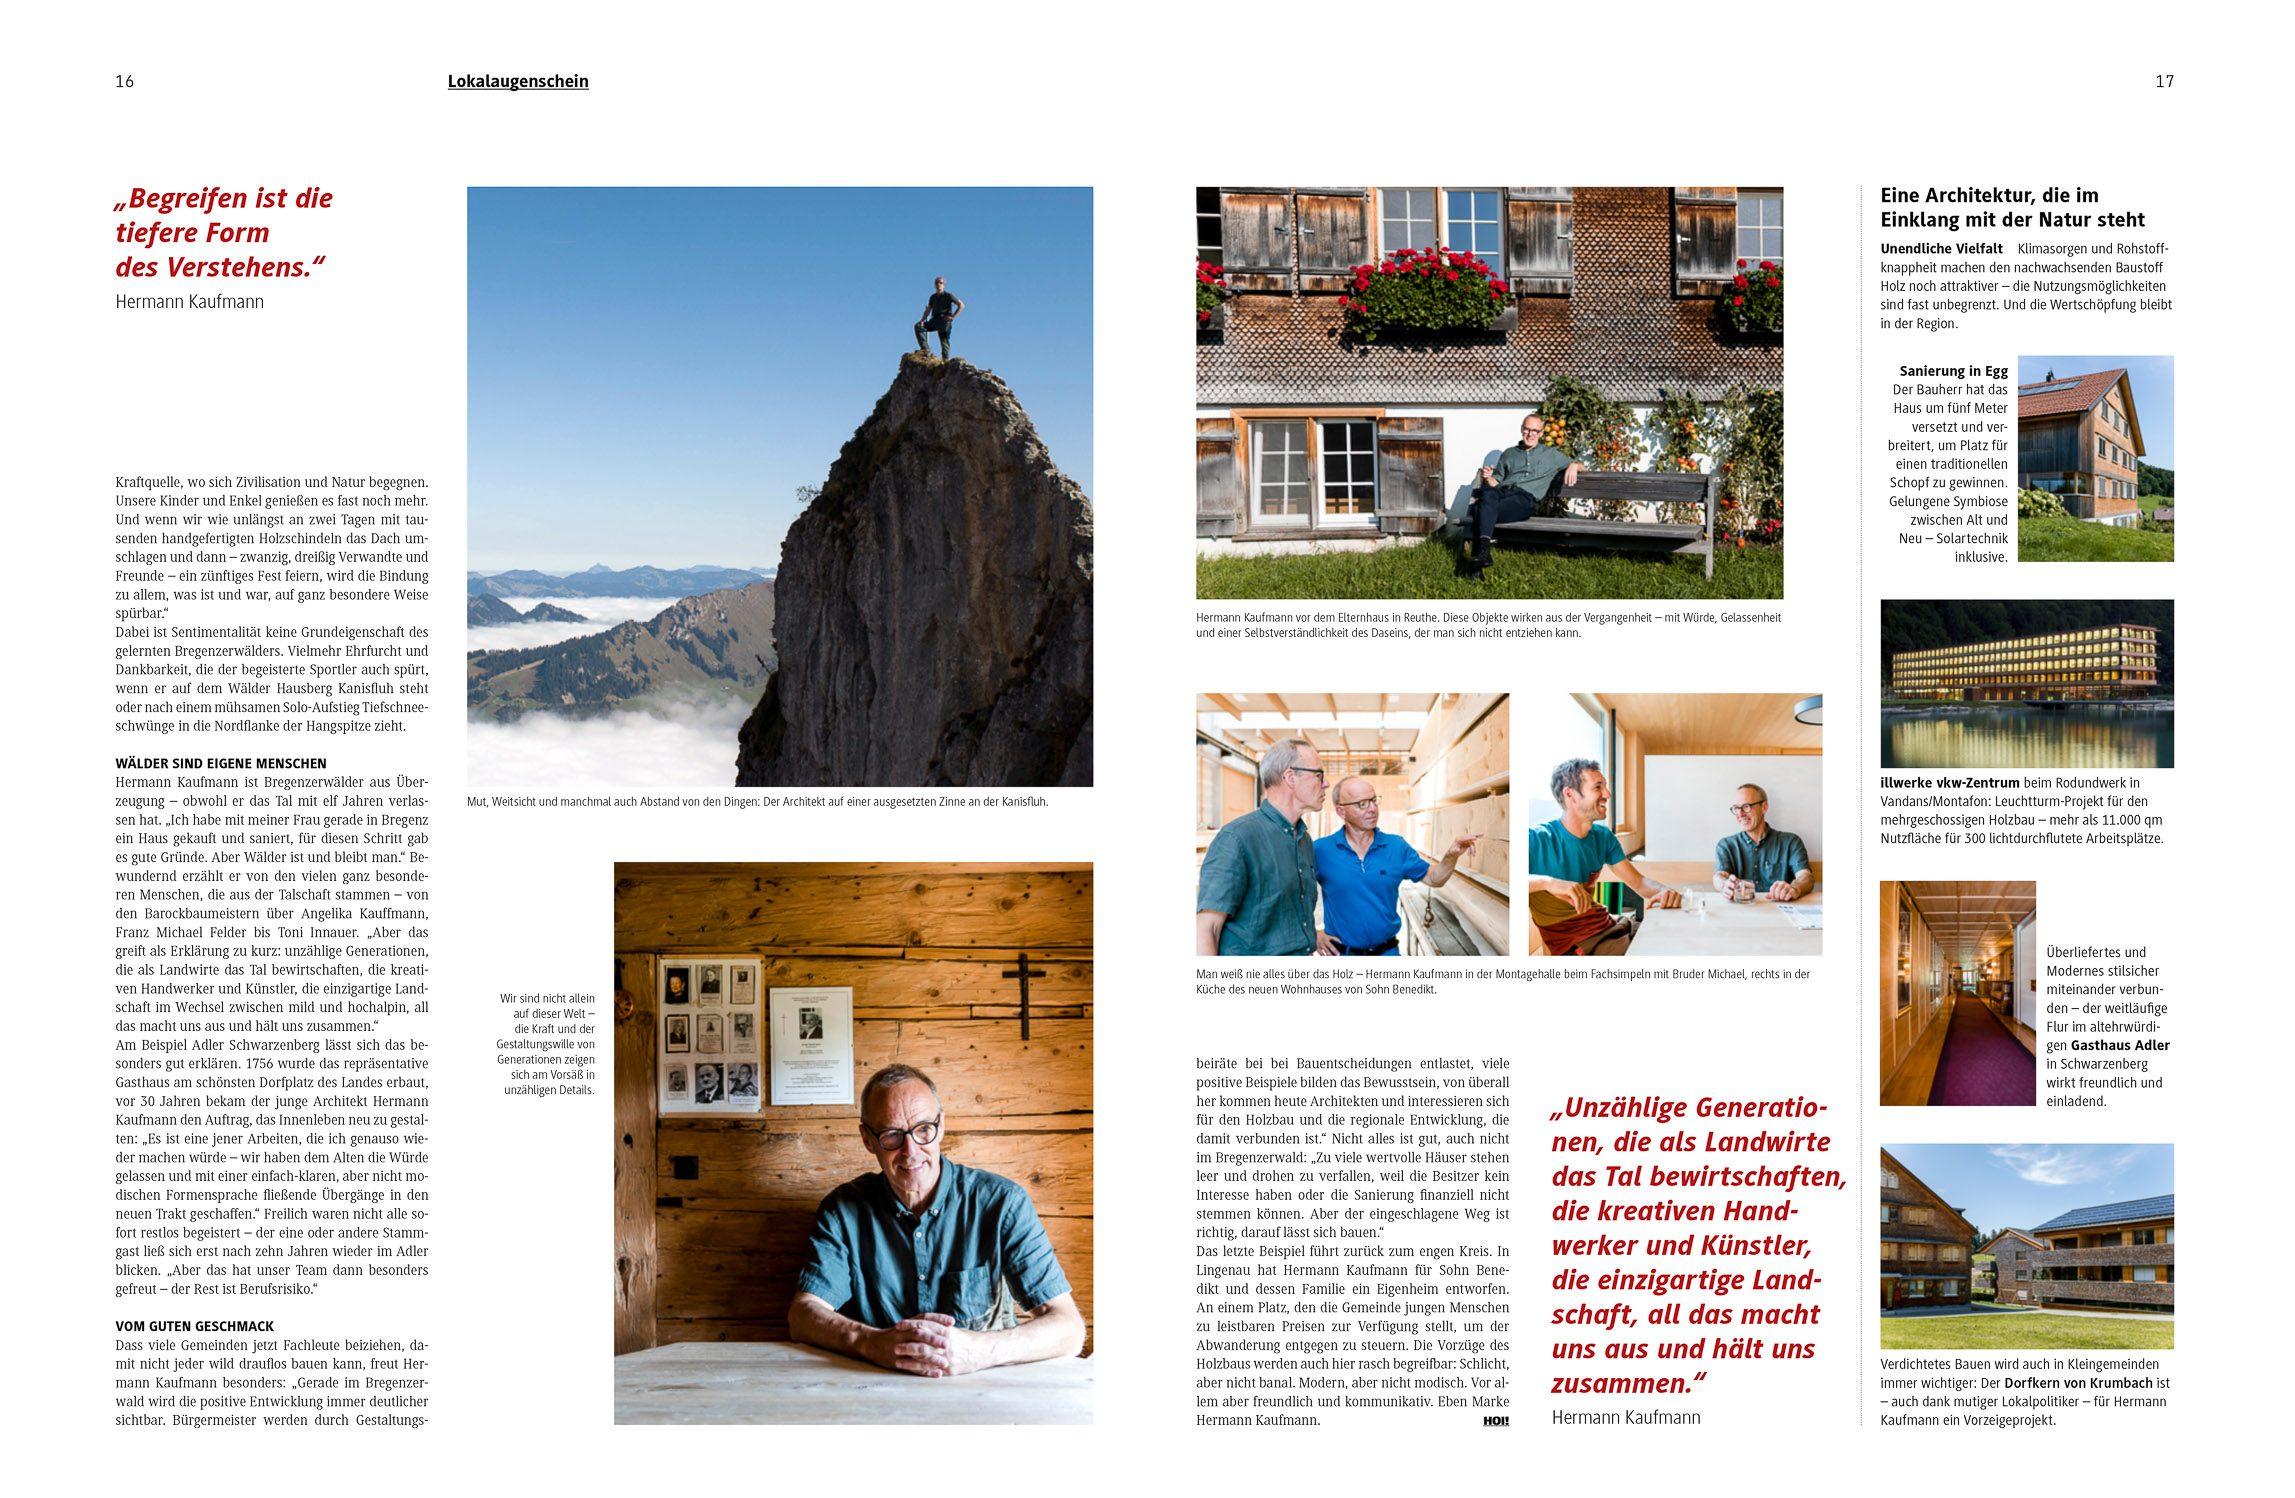 Referenz, Lisa Dünser Fotografie, Hoi, Das Vorarlberg Magazin